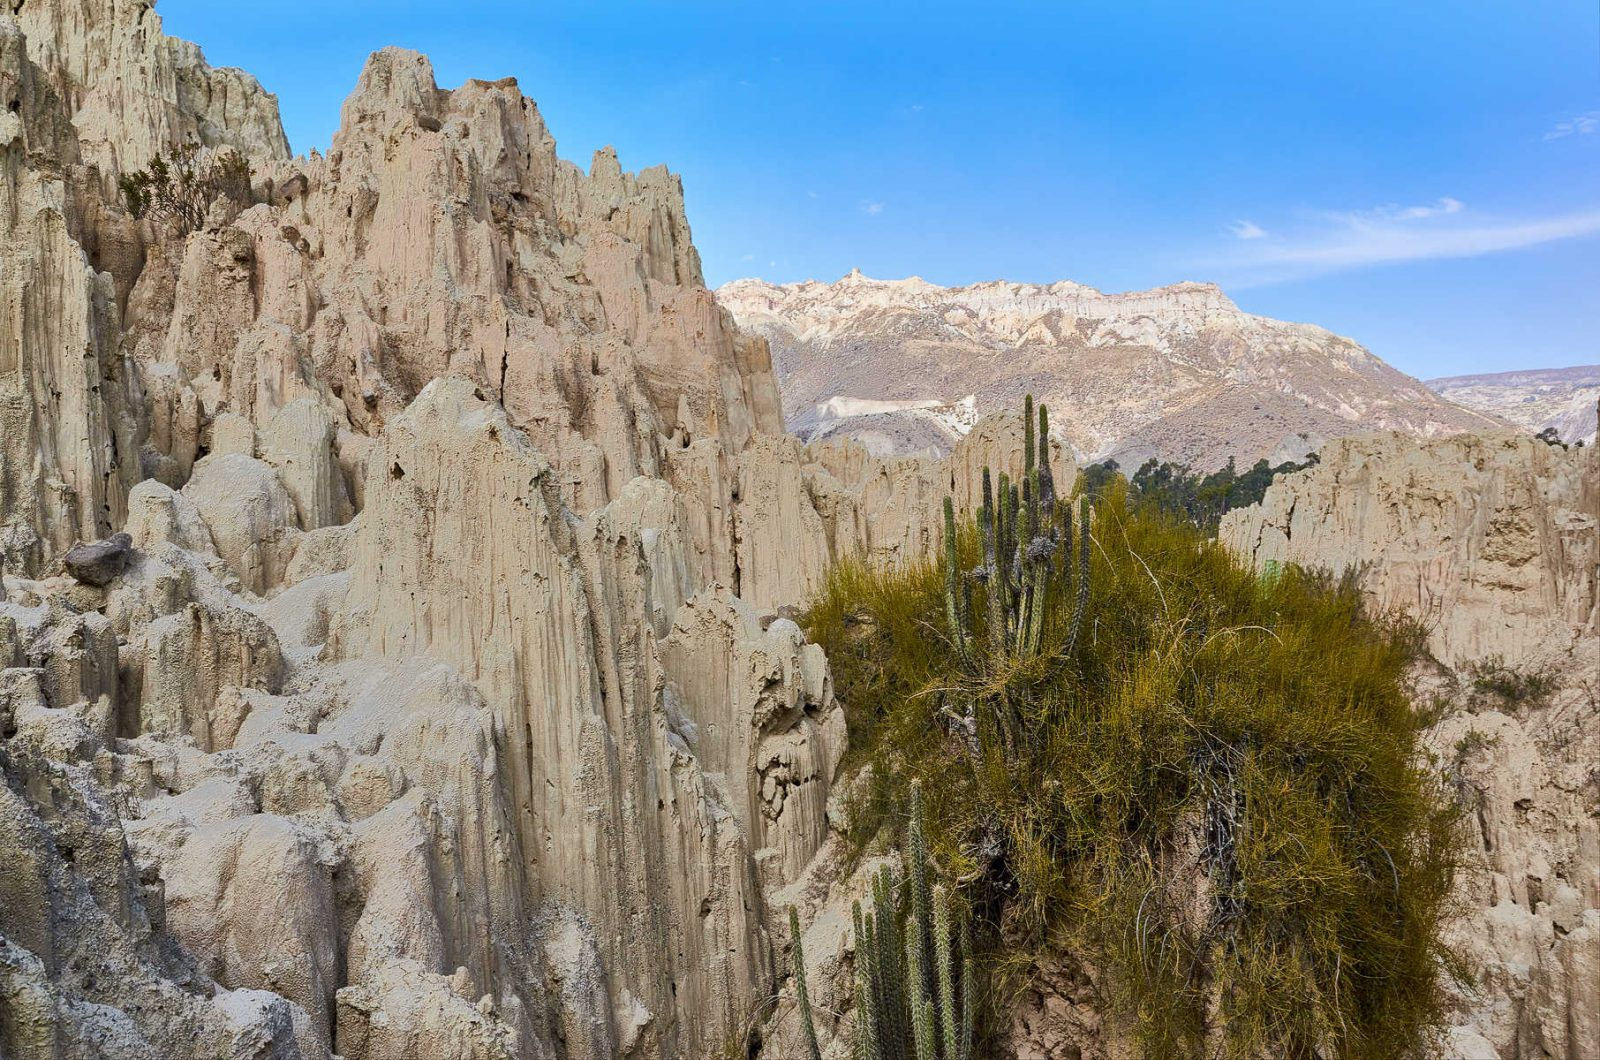 Valle de la Luna knapp zehn Kilometern südöstlich von La Paz, Bolivien 2016